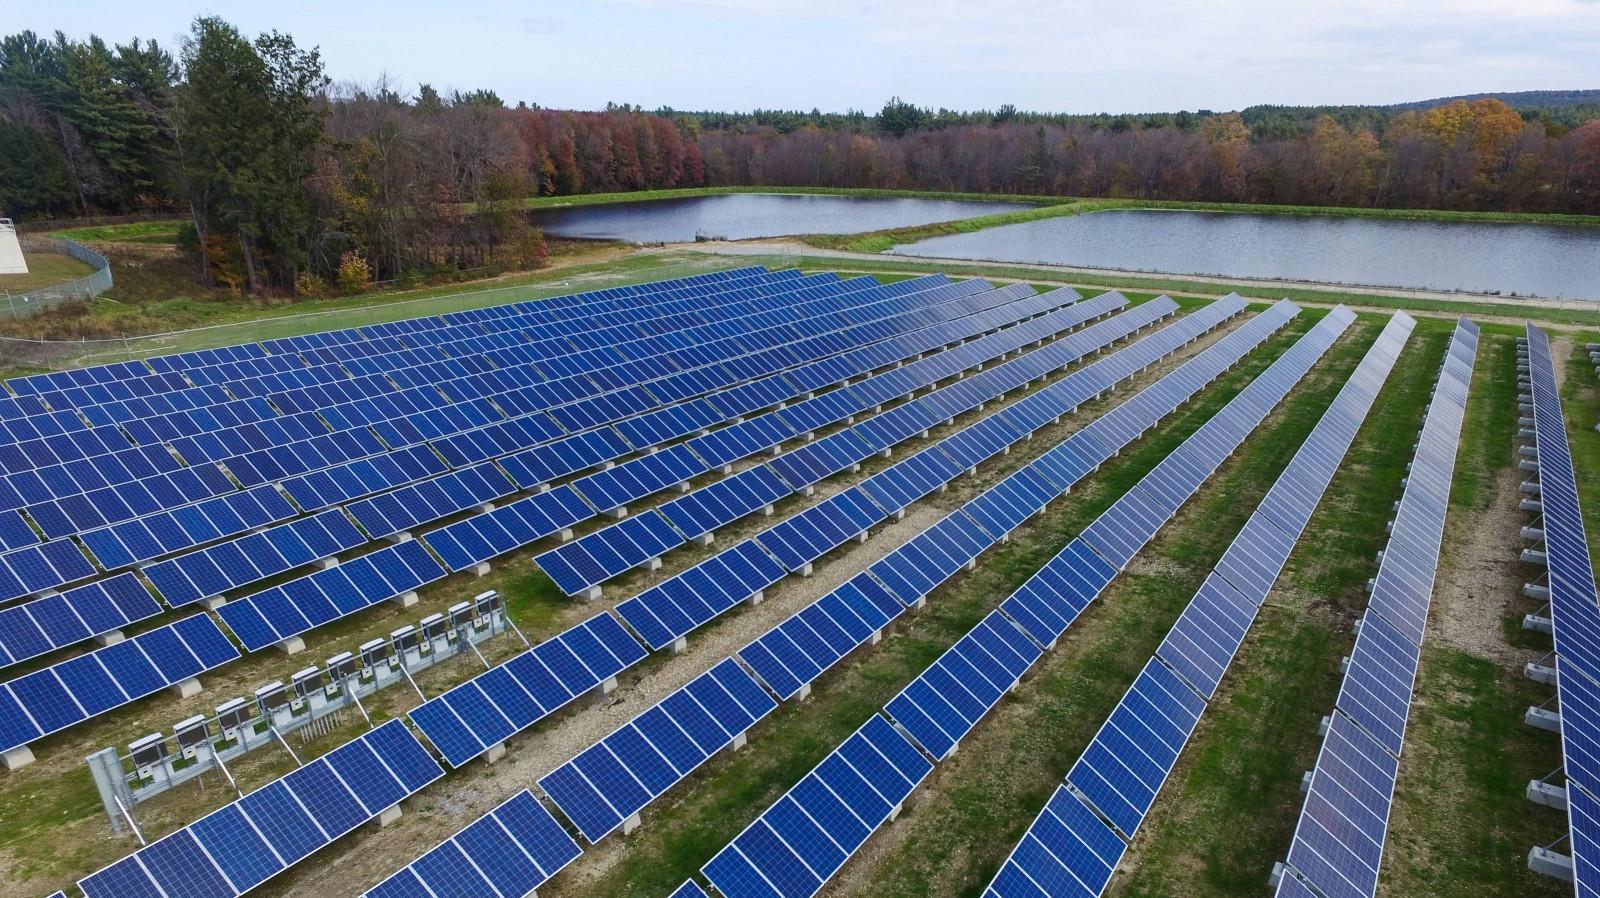 SunEdison Completes Construction Of New Hampshire's Largest Solar Power Plant